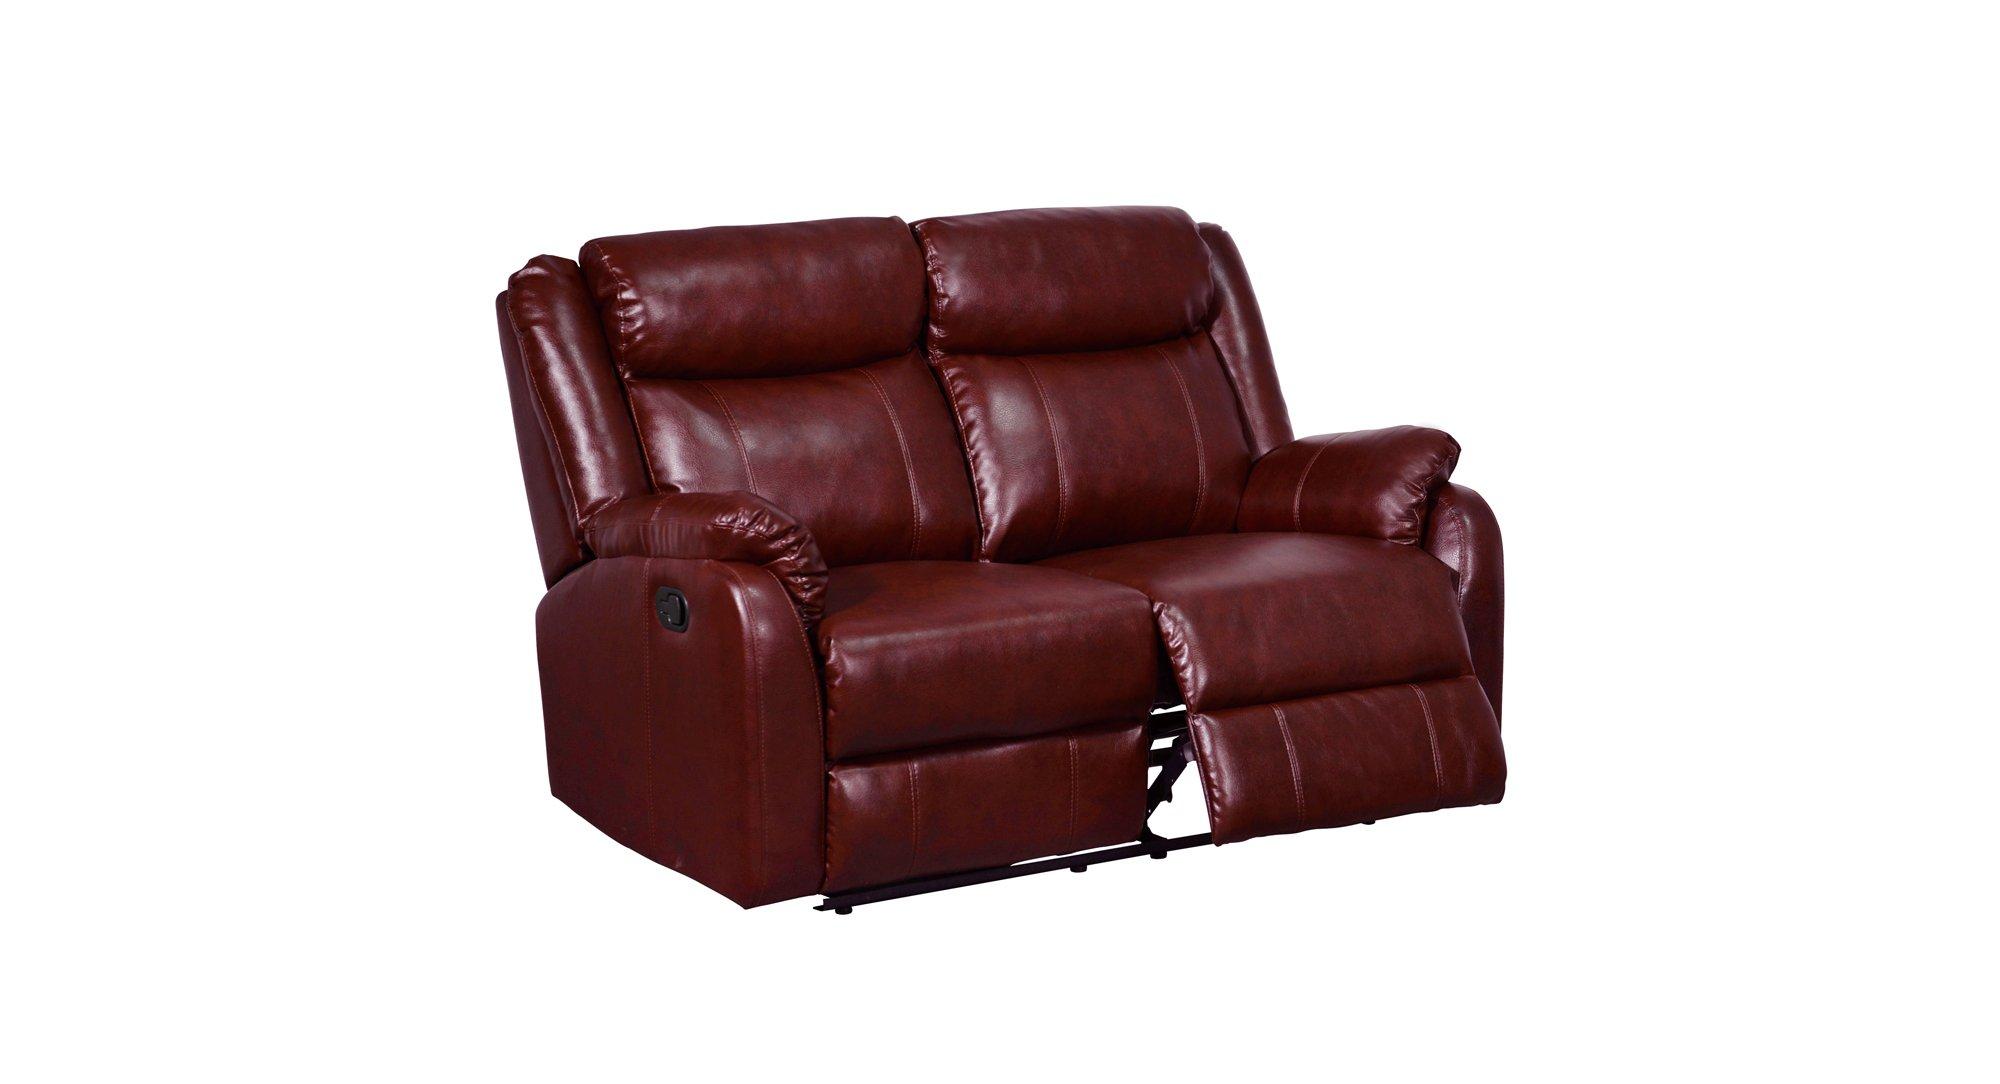 Magnificent U9303 Burgundy Pu Reclining Loveseat By Global Furniture Inzonedesignstudio Interior Chair Design Inzonedesignstudiocom